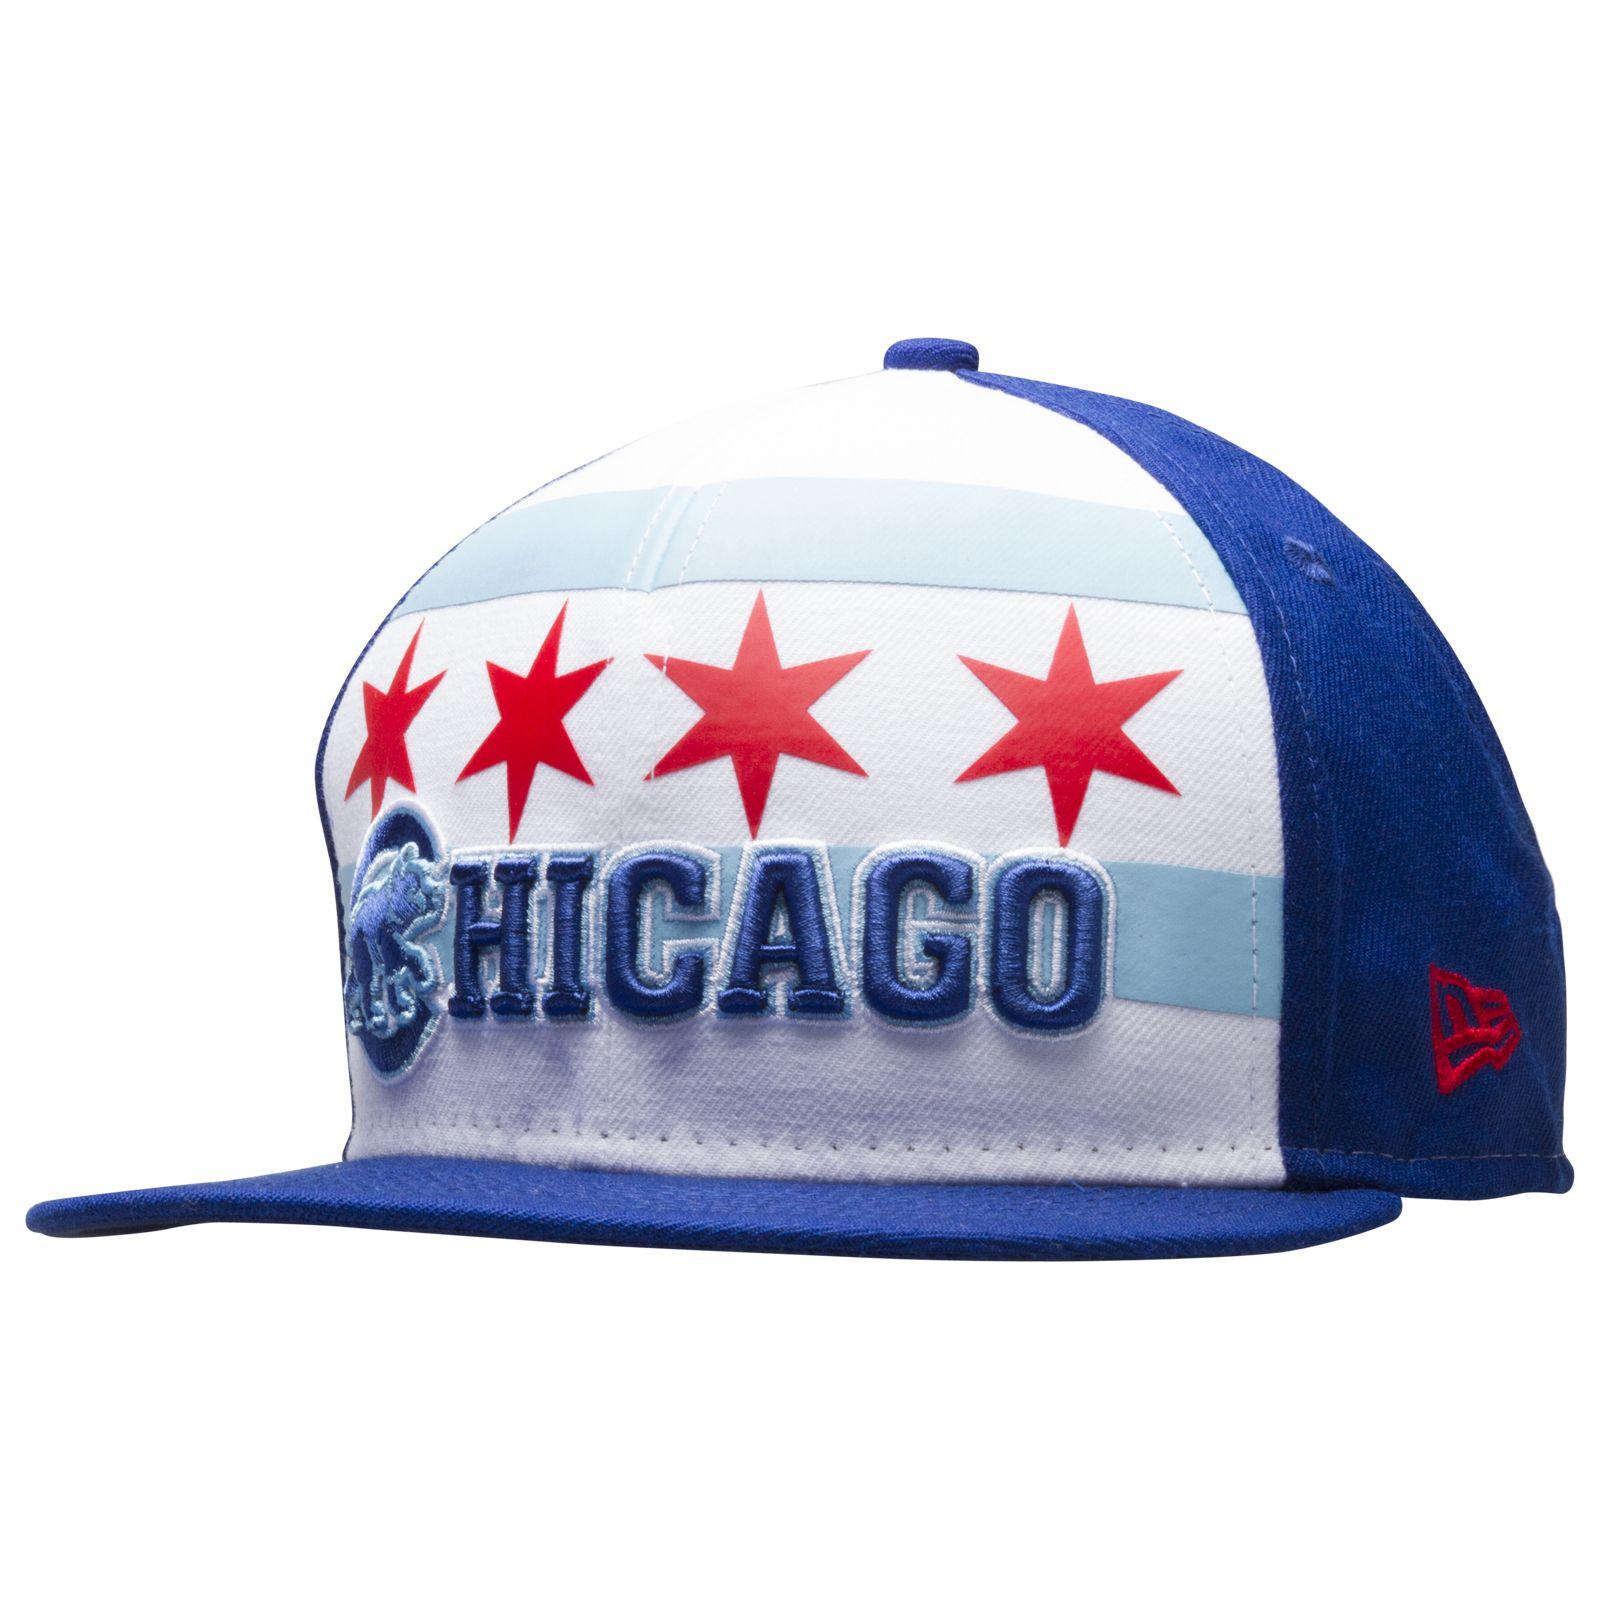 6b21af19a55 Chicago Cubs Chicago Flag Crawl Bear Snapback Hat by New Era  Chicago  Cubs   ChicagoCubs